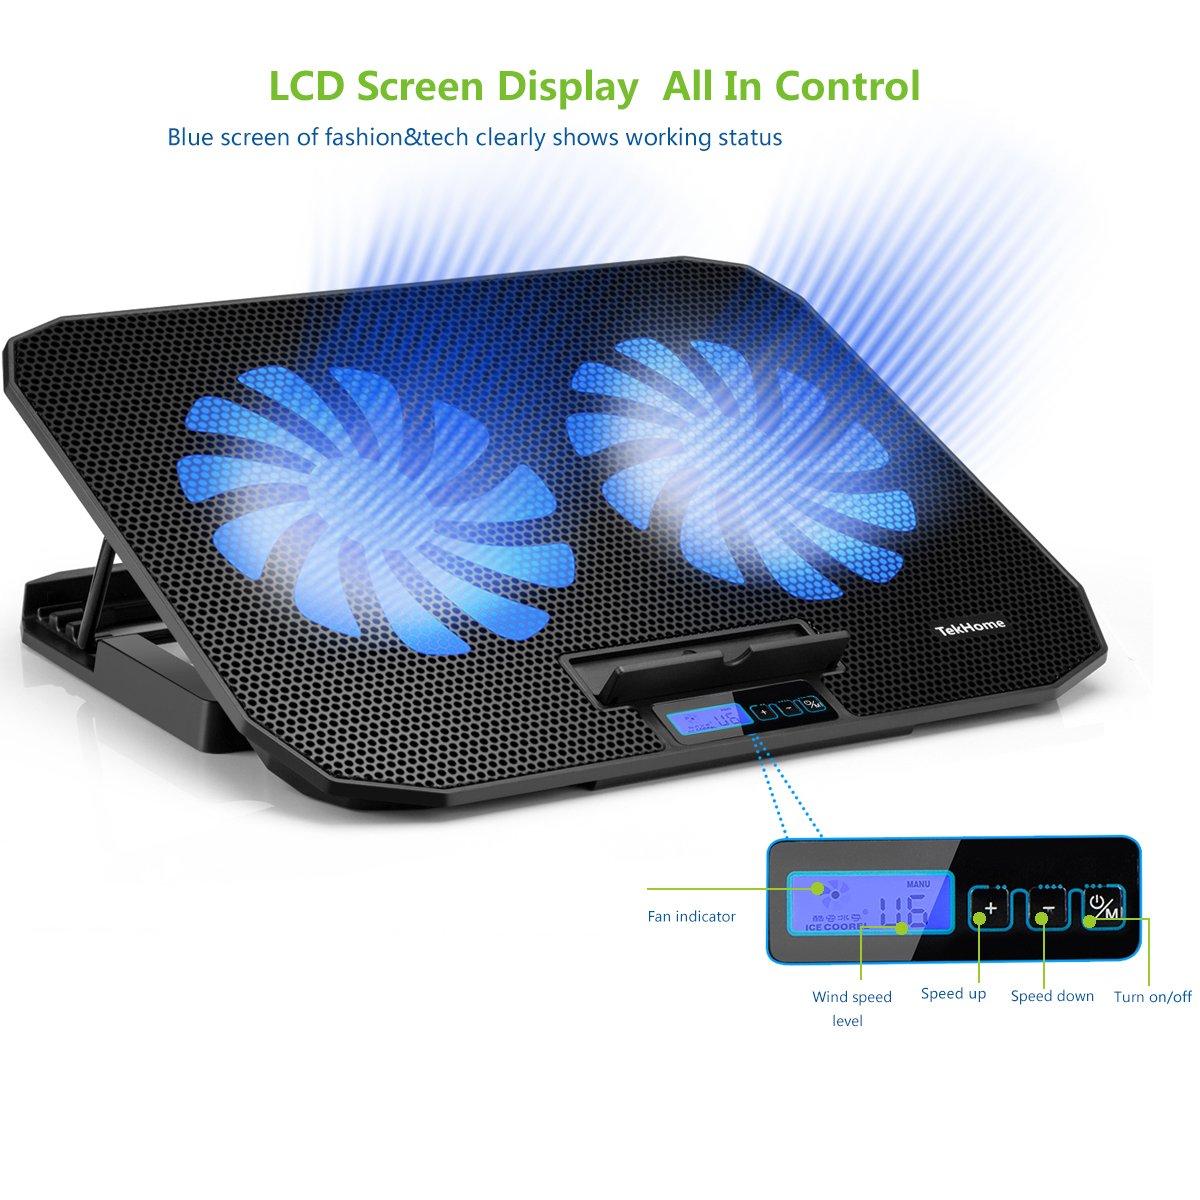 Msi Fan Control Laptop